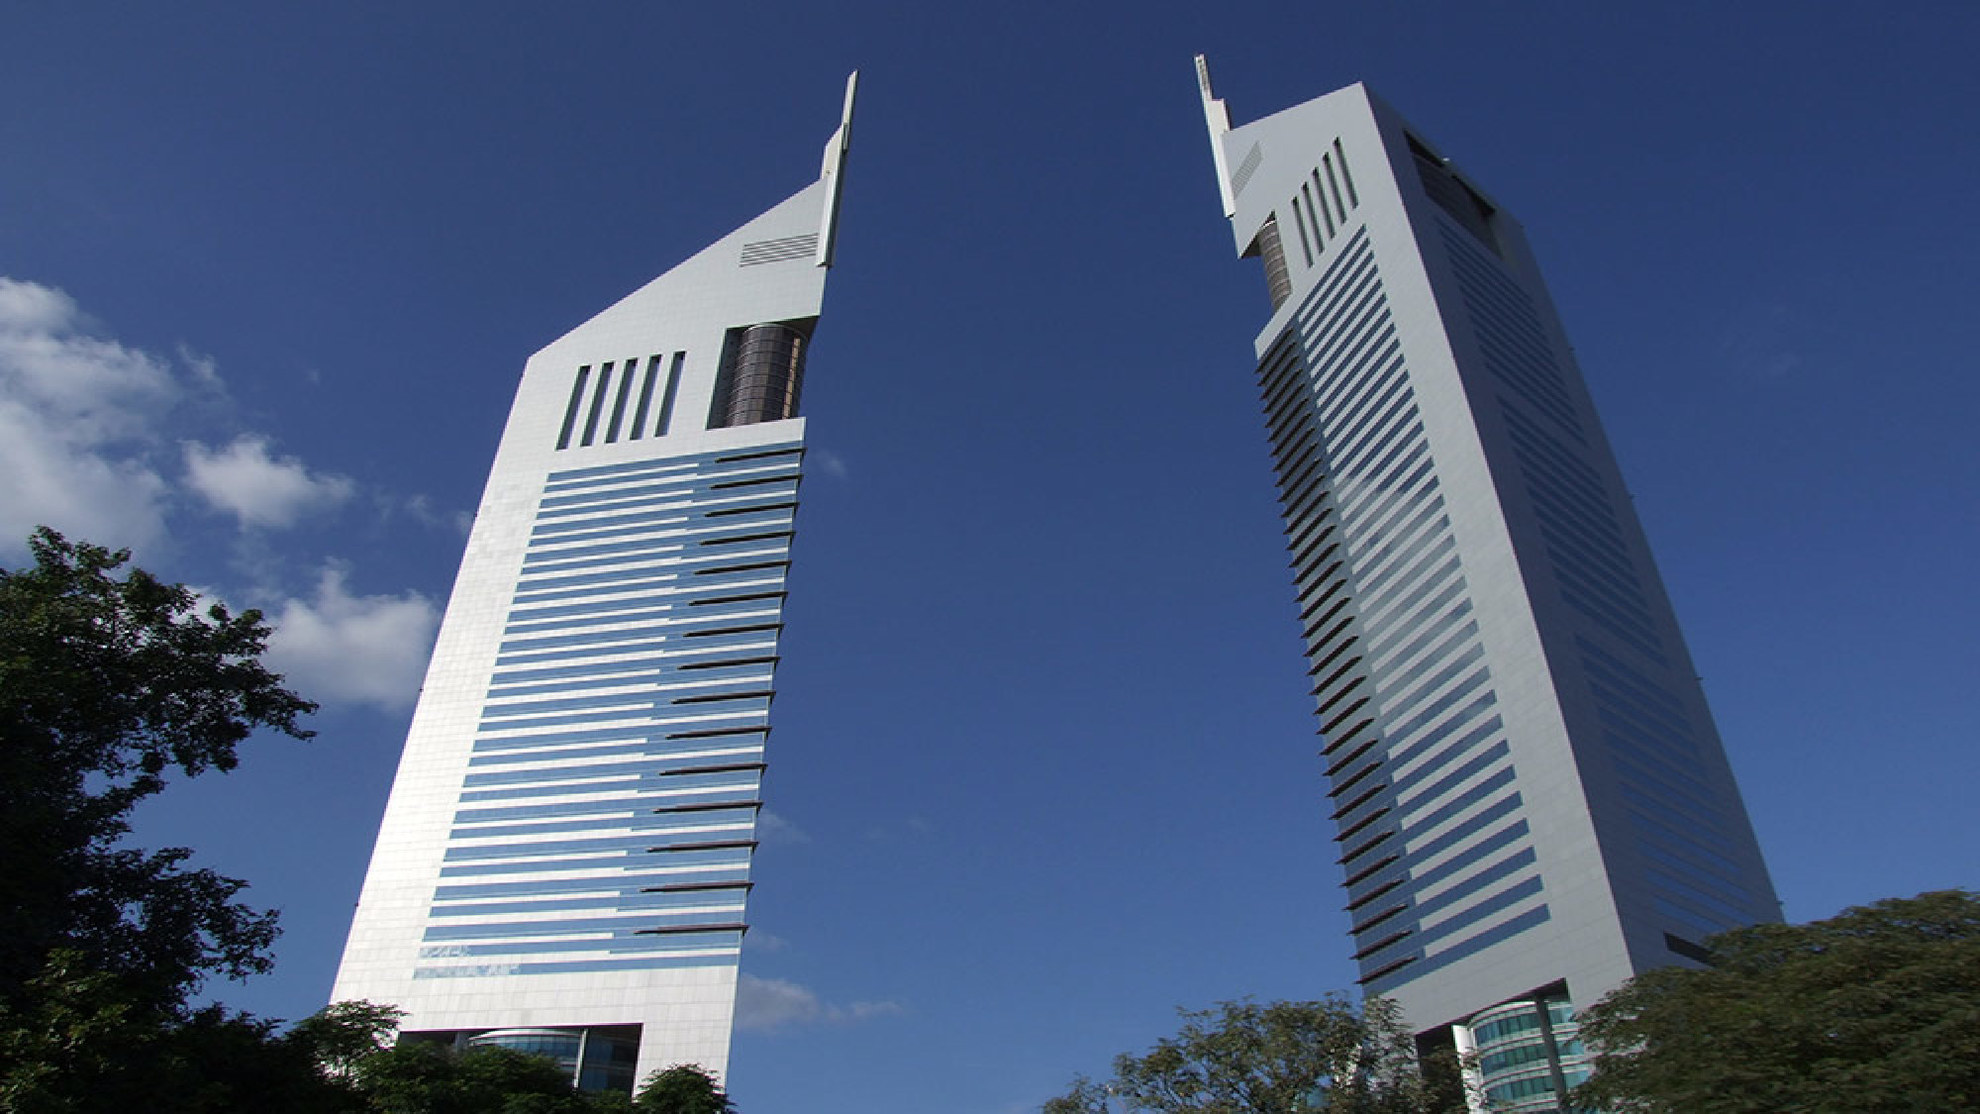 Burj Al Arab | Steven's Travels and Thoughts  |Palm Island Dubai From Burj Hotel